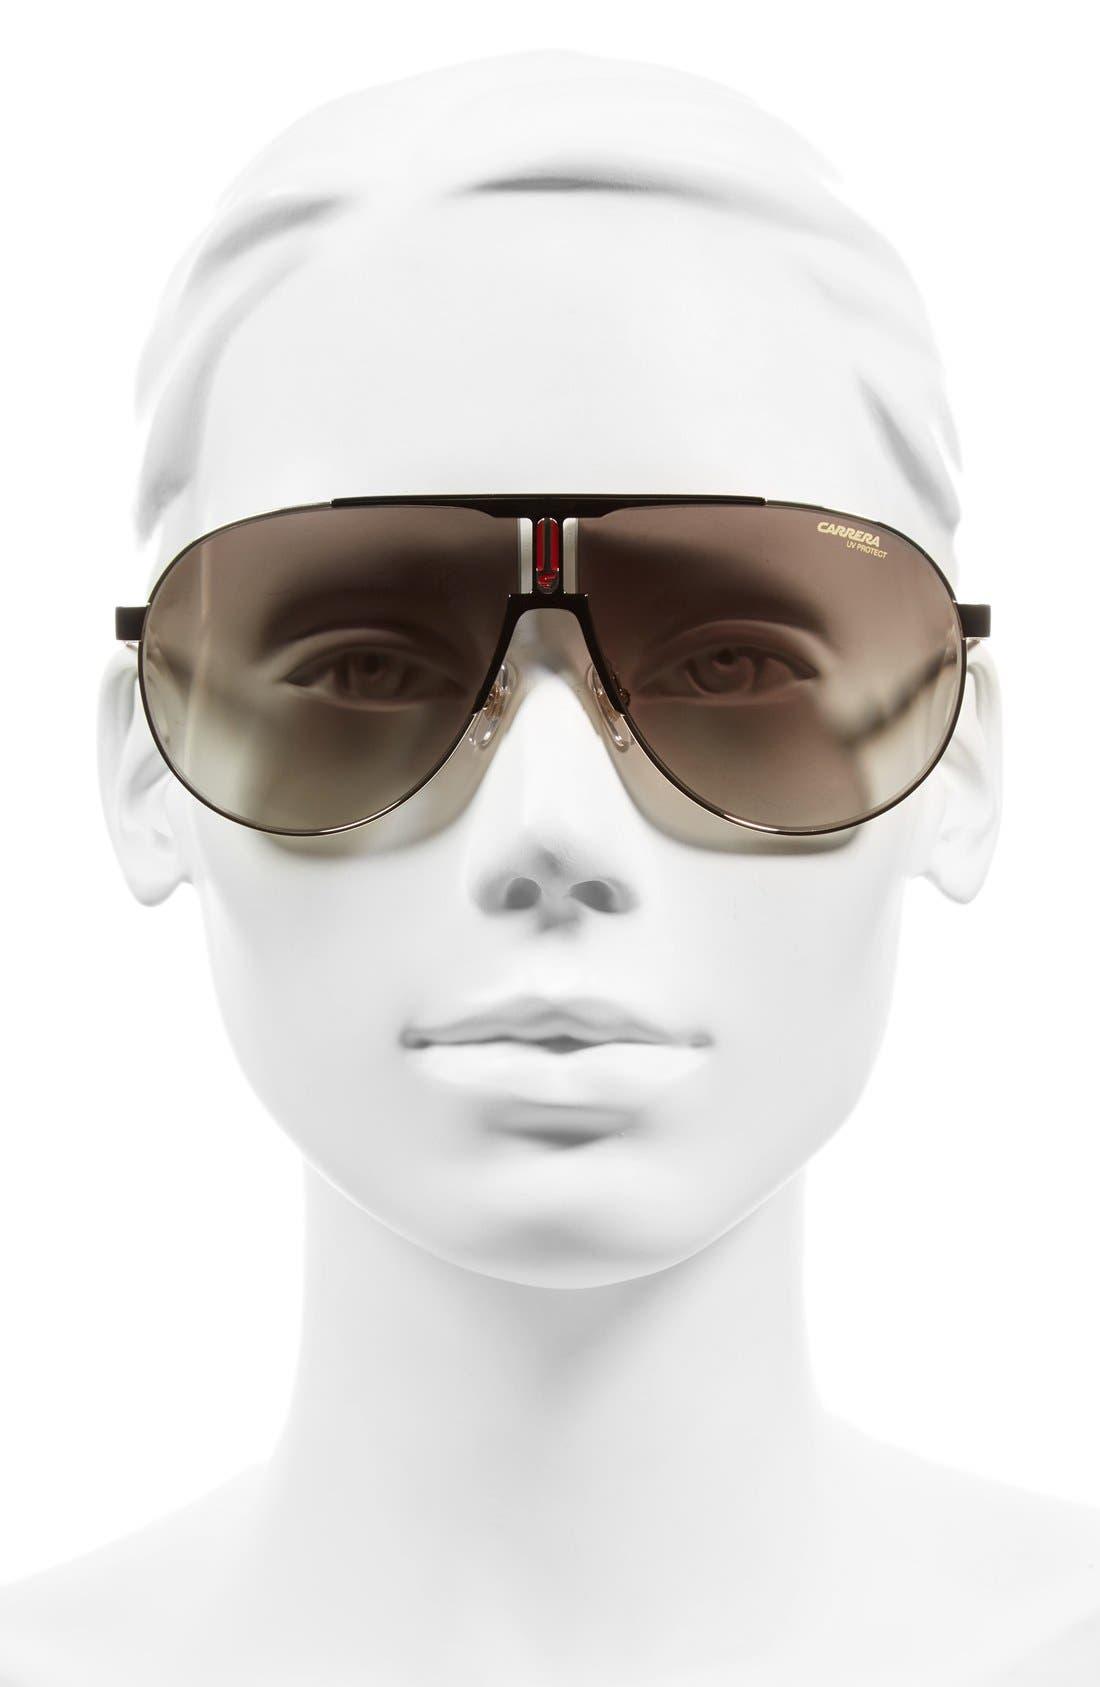 66mm Aviator Sunglasses,                             Alternate thumbnail 4, color,                             001